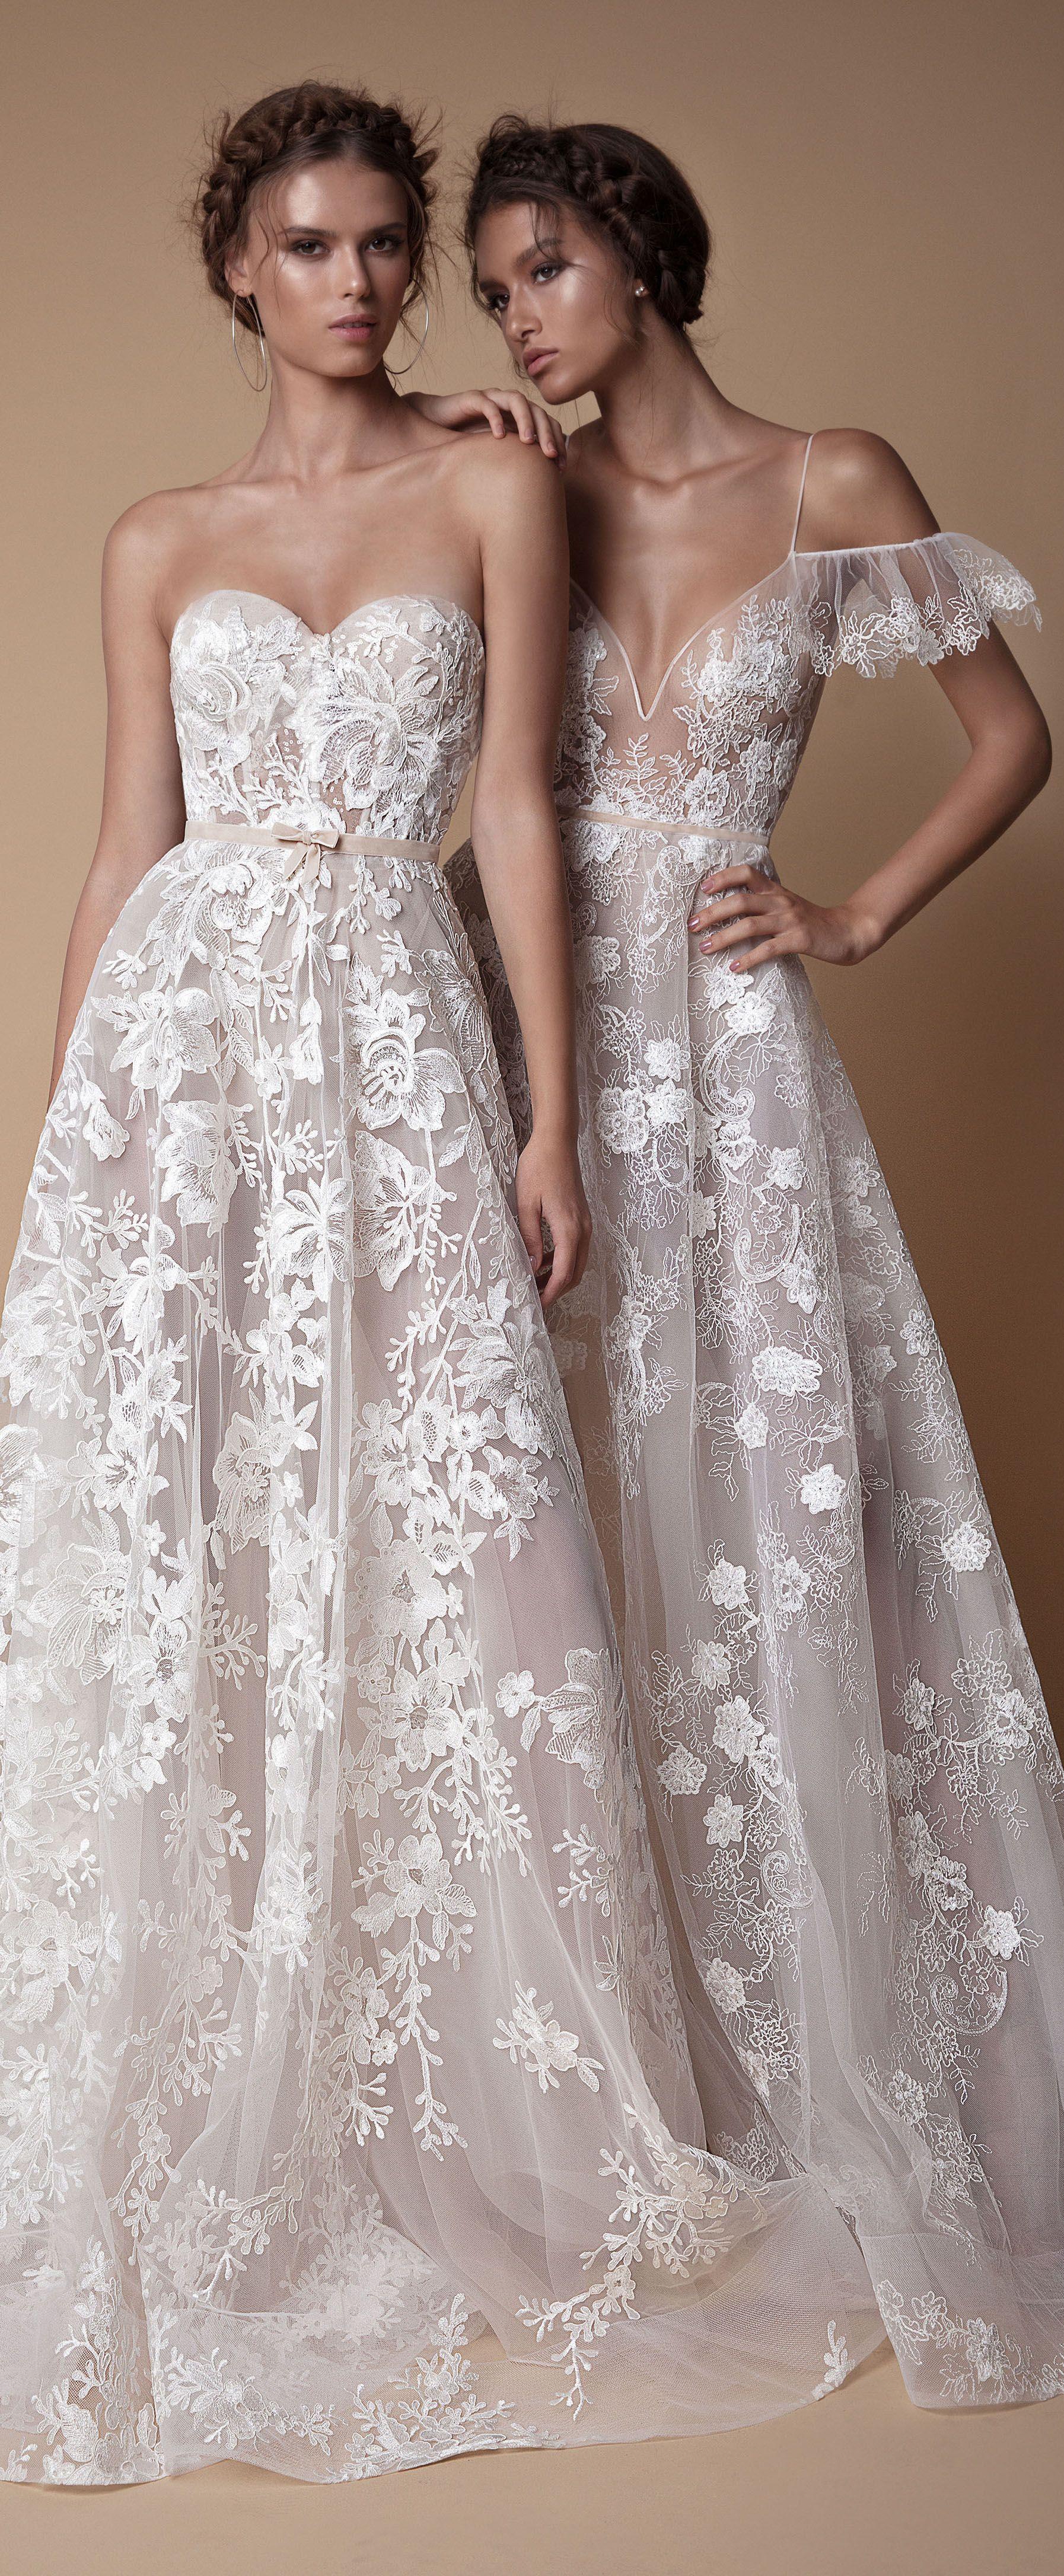 Berta muse collection bertabridal weddingdresses